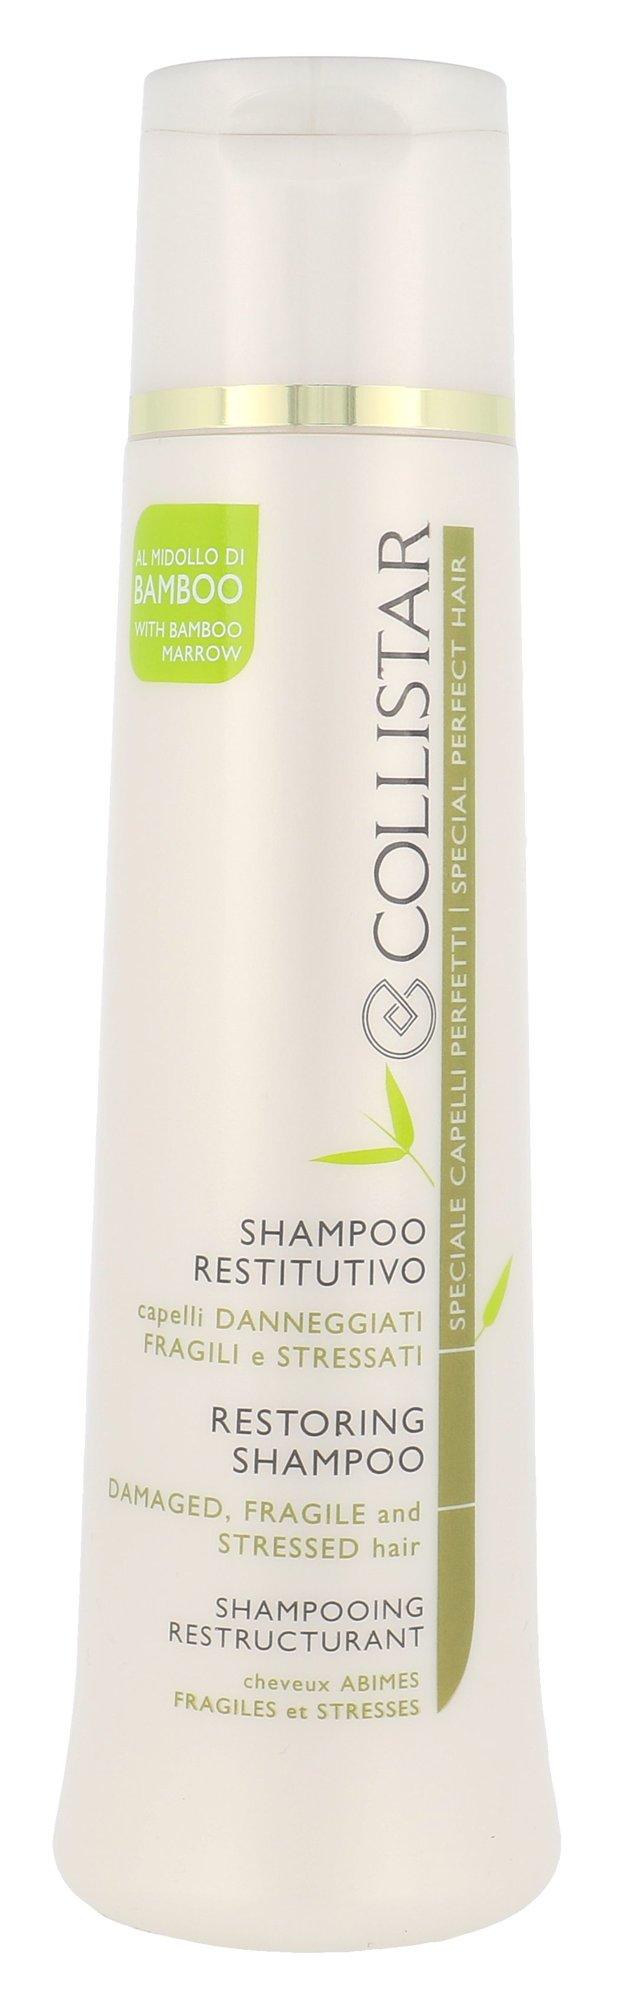 Collistar Restoring Cosmetic 250ml